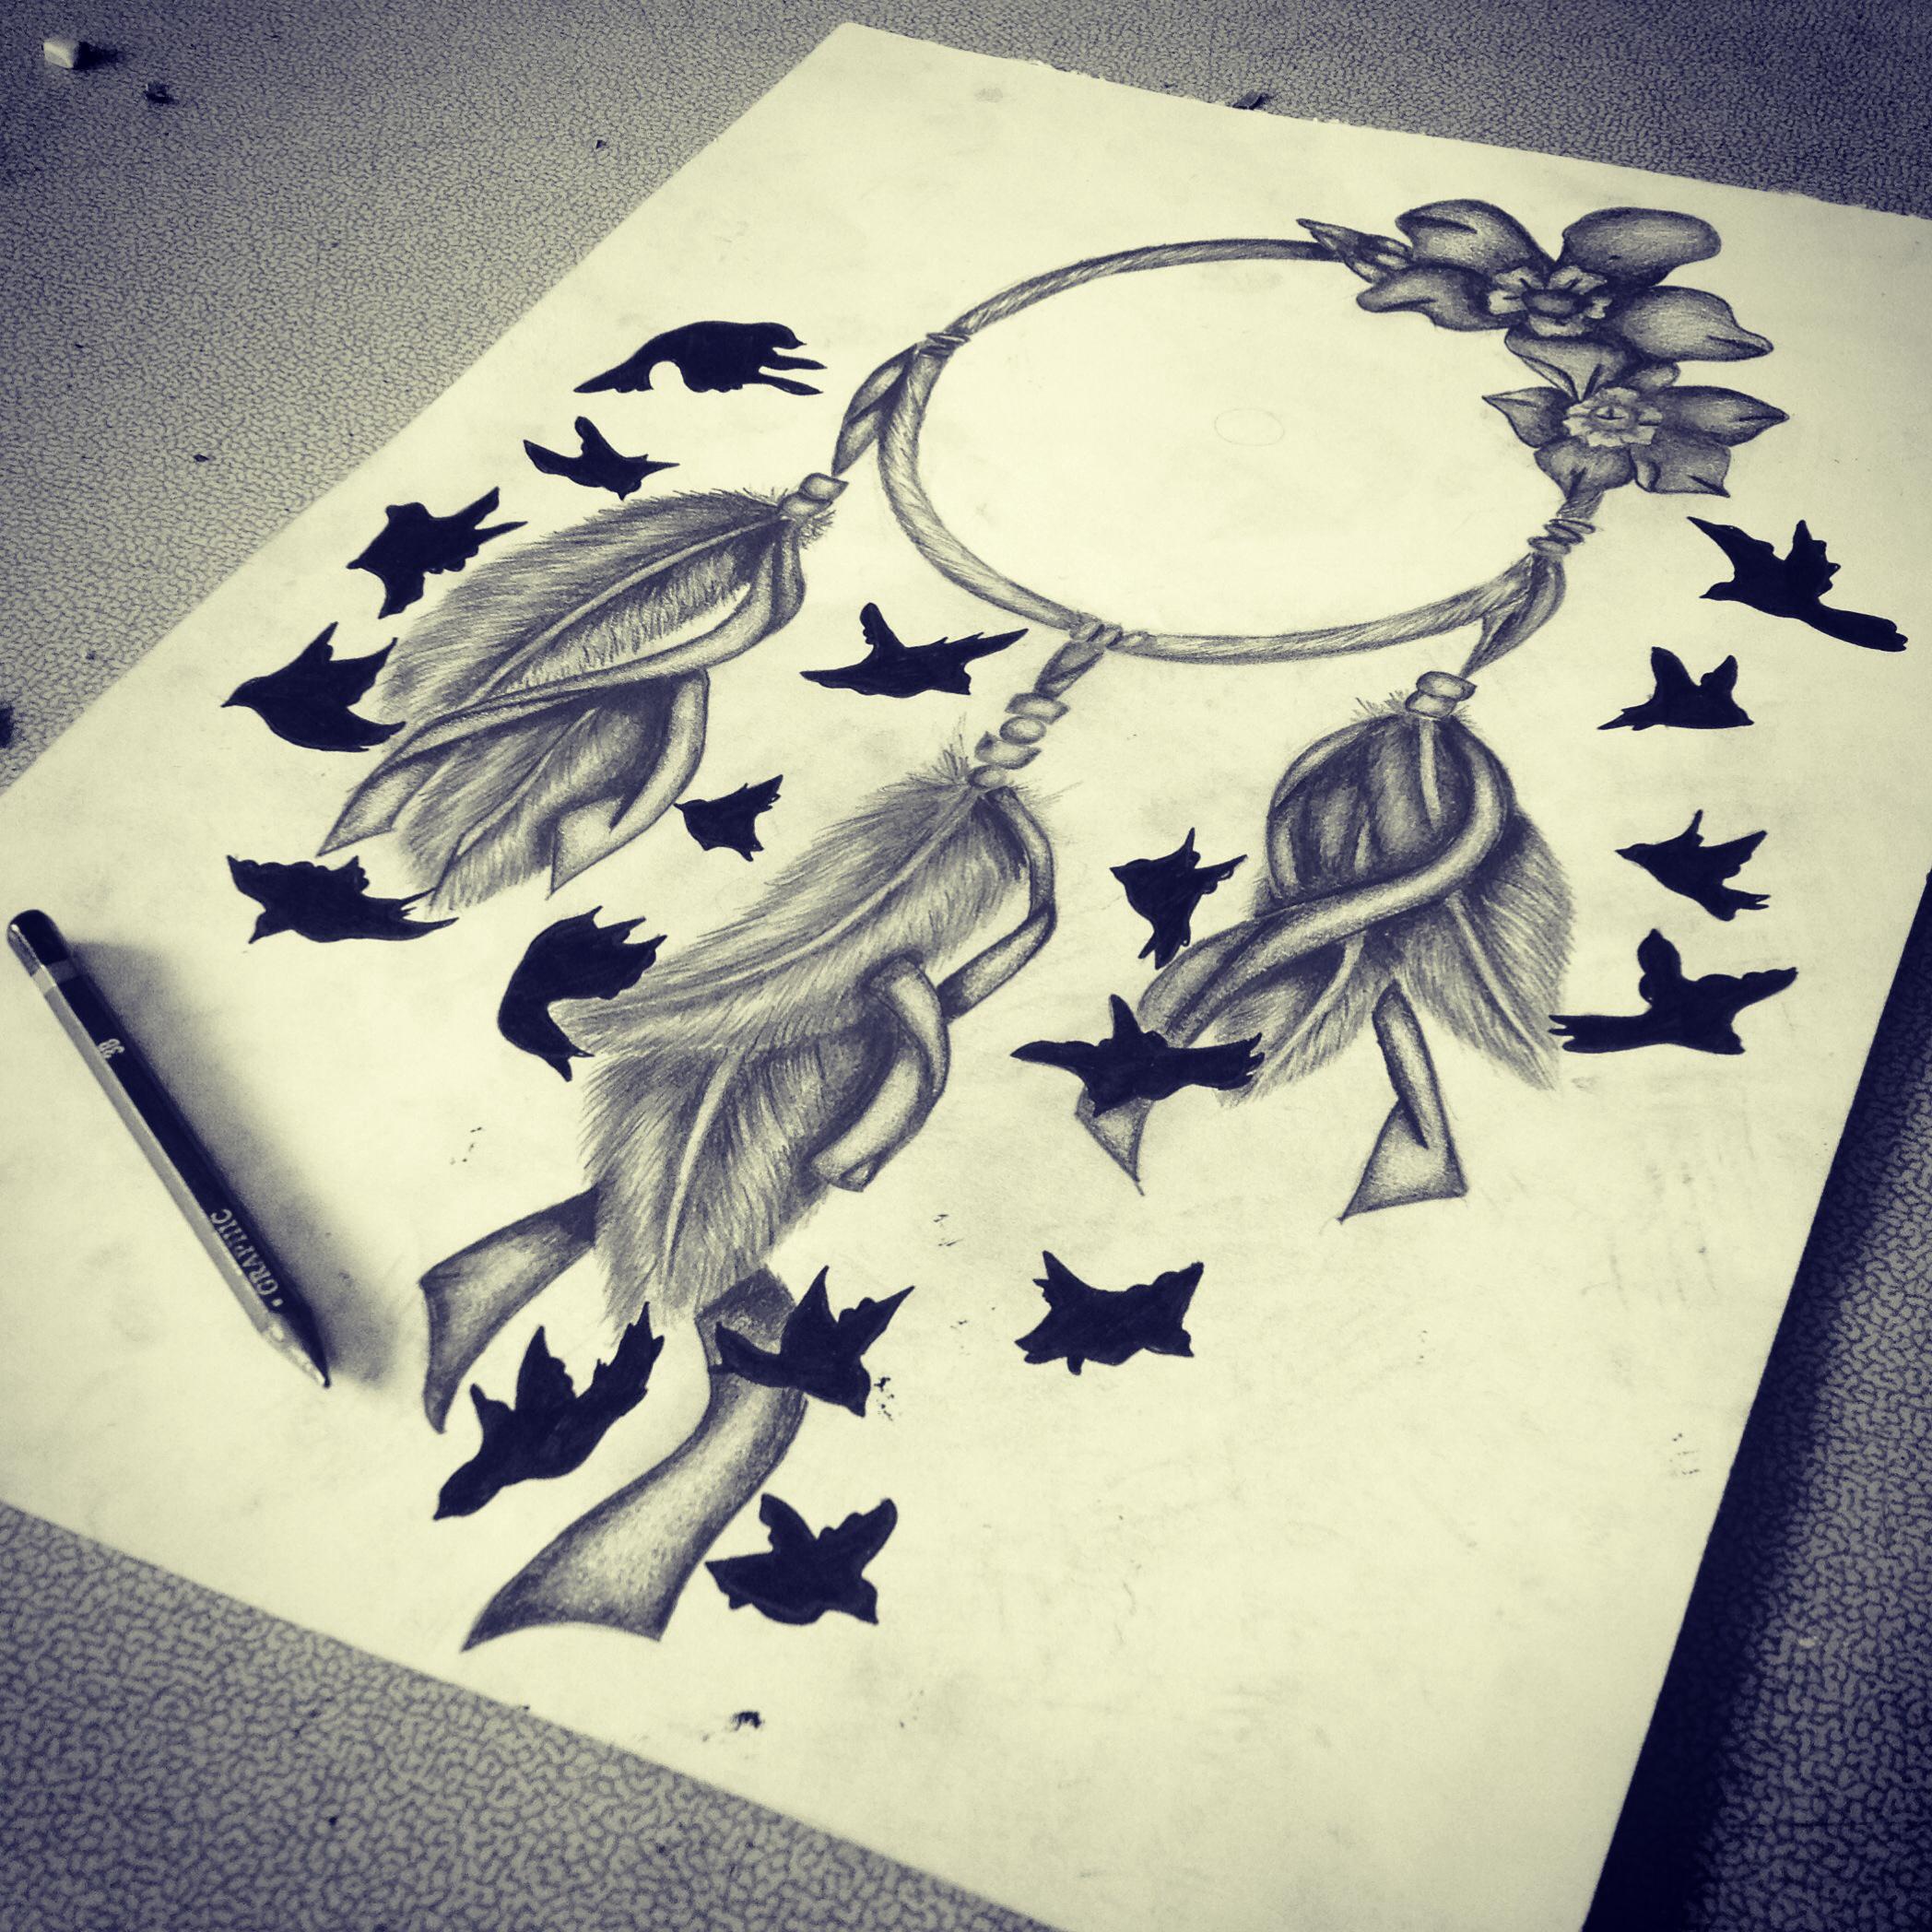 2096x2096 Lovely Dream Catchers Pencil Sketches Images A Level Art Dream